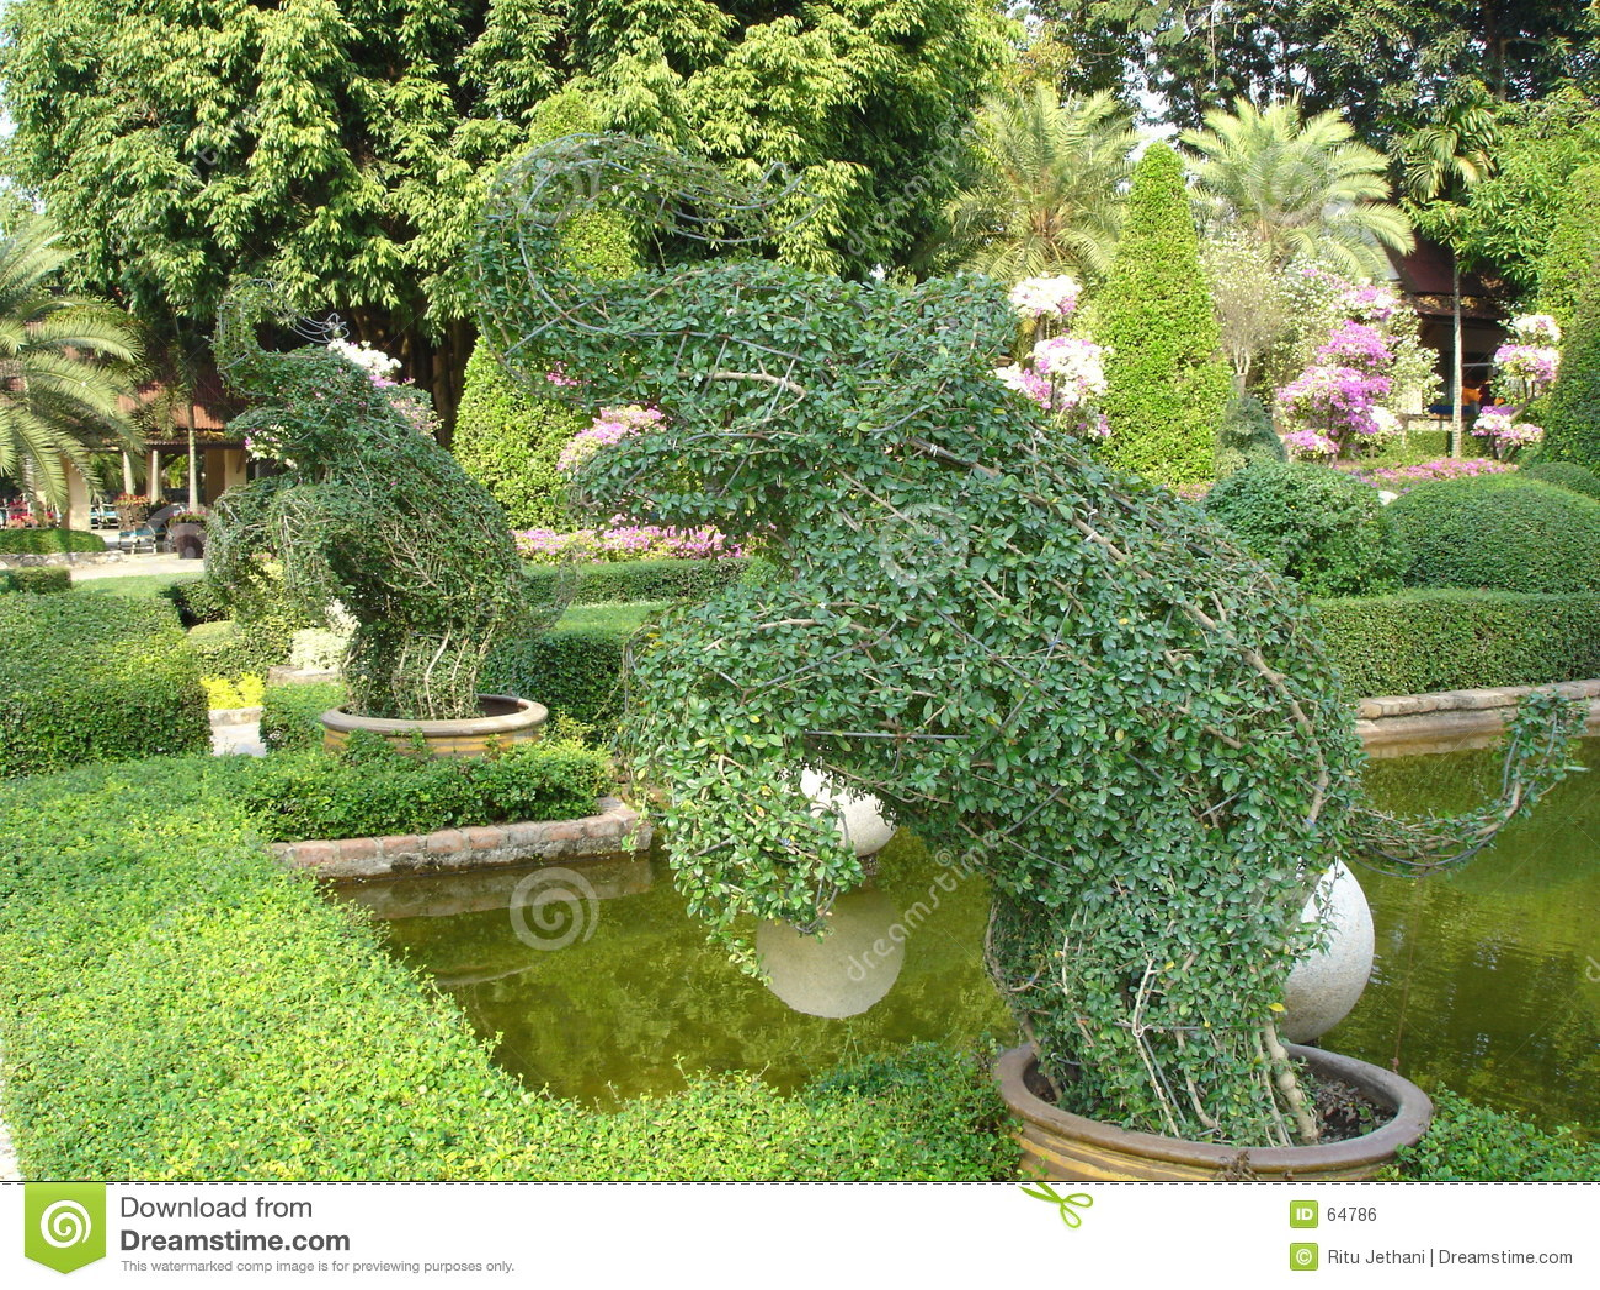 fotos de jardim tropical : fotos de jardim tropical:Jardim Tropical De Nong Nooch Imagem de Stock Royalty Free – Imagem